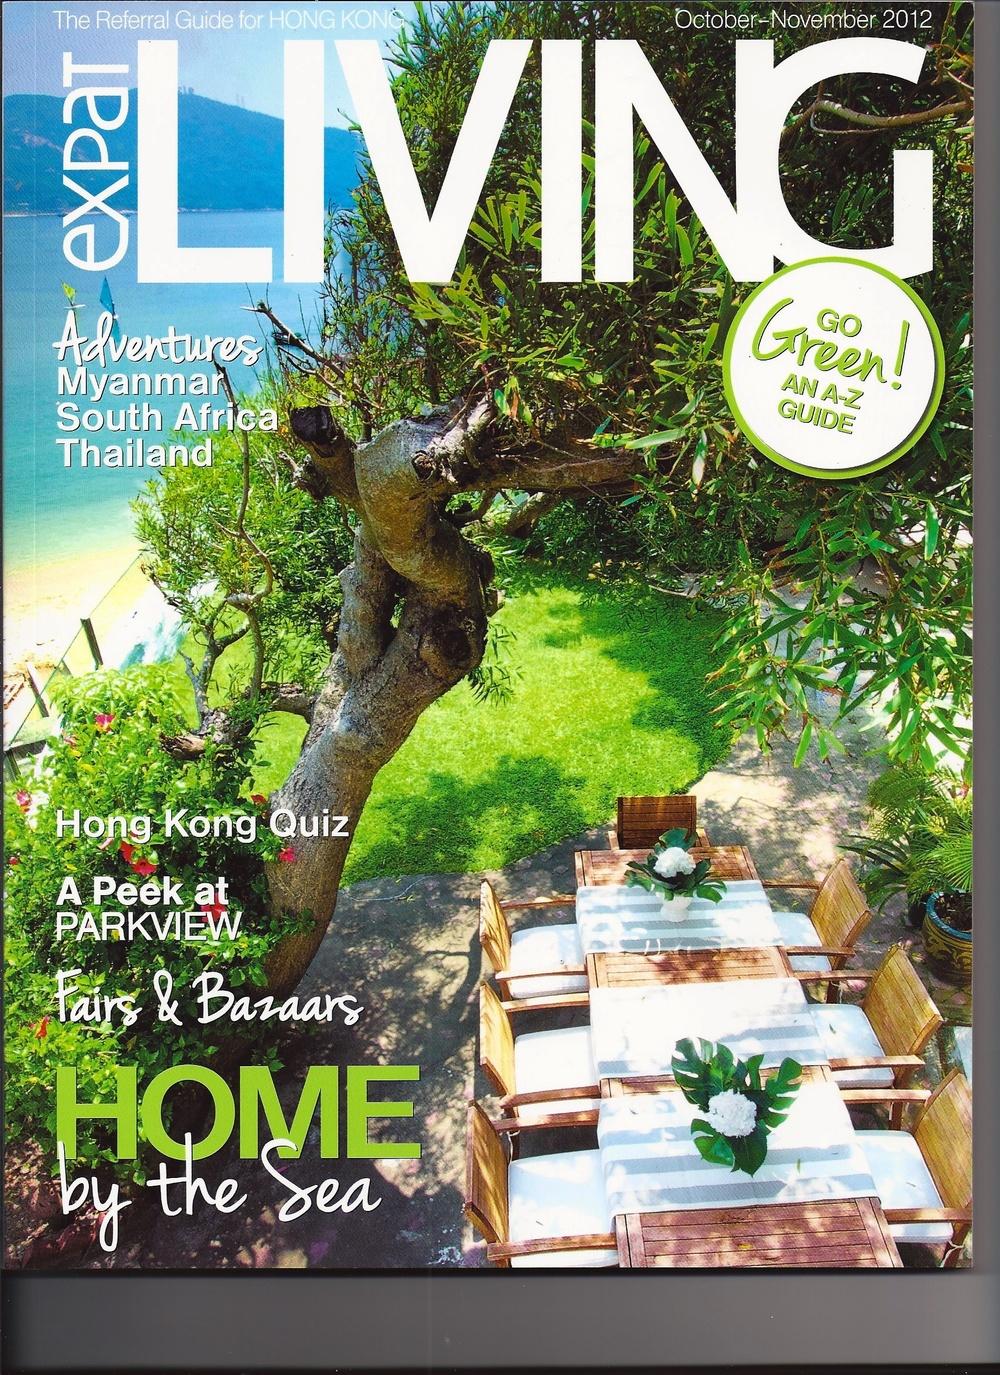 2012-10 Expat Living 01.jpg